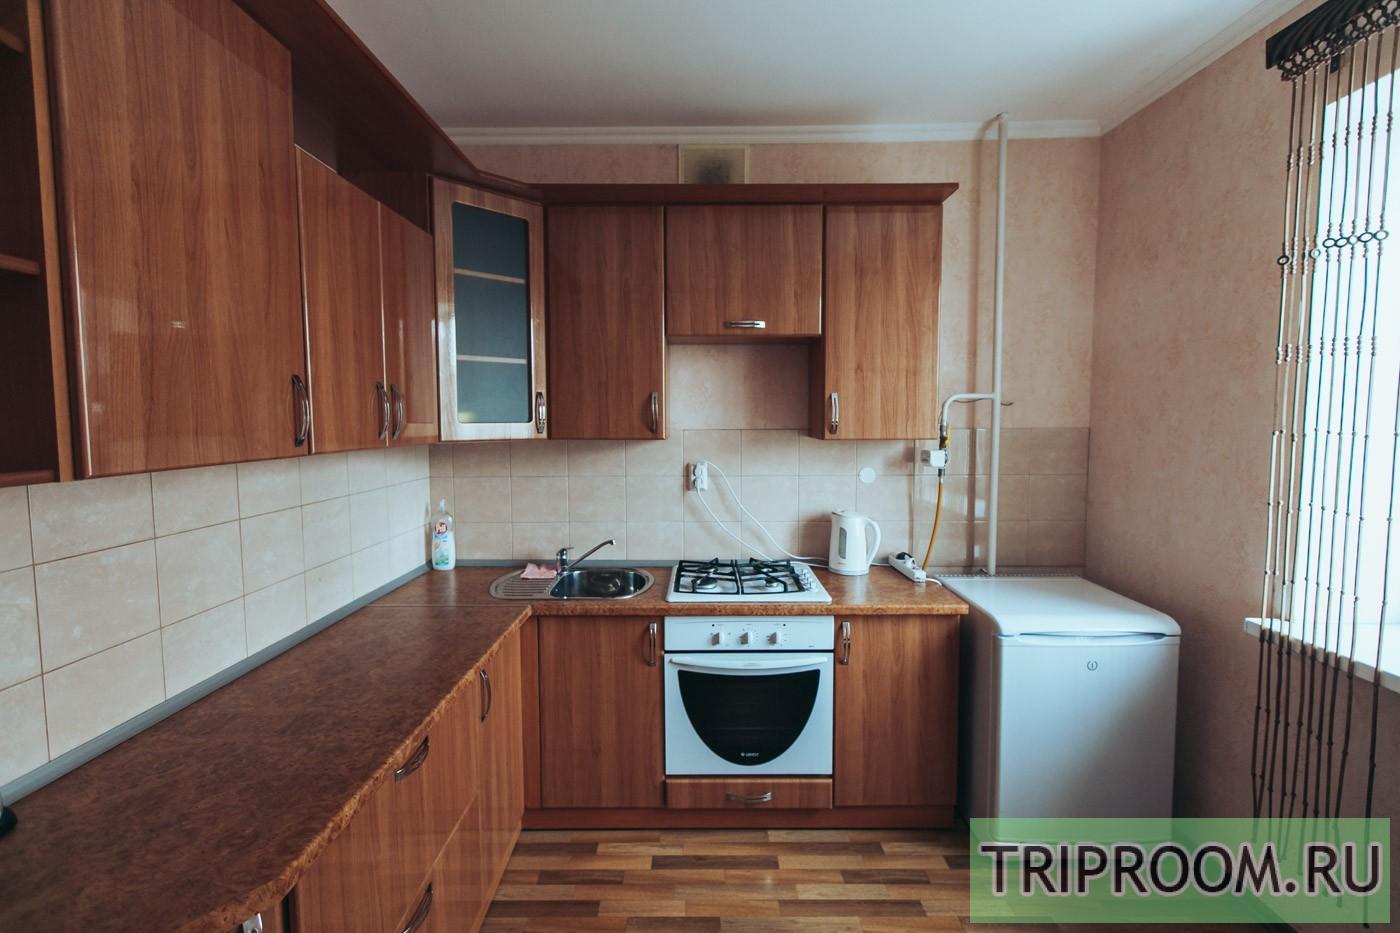 1-комнатная квартира посуточно (вариант № 30979), ул. Петра Смородина улица, фото № 7